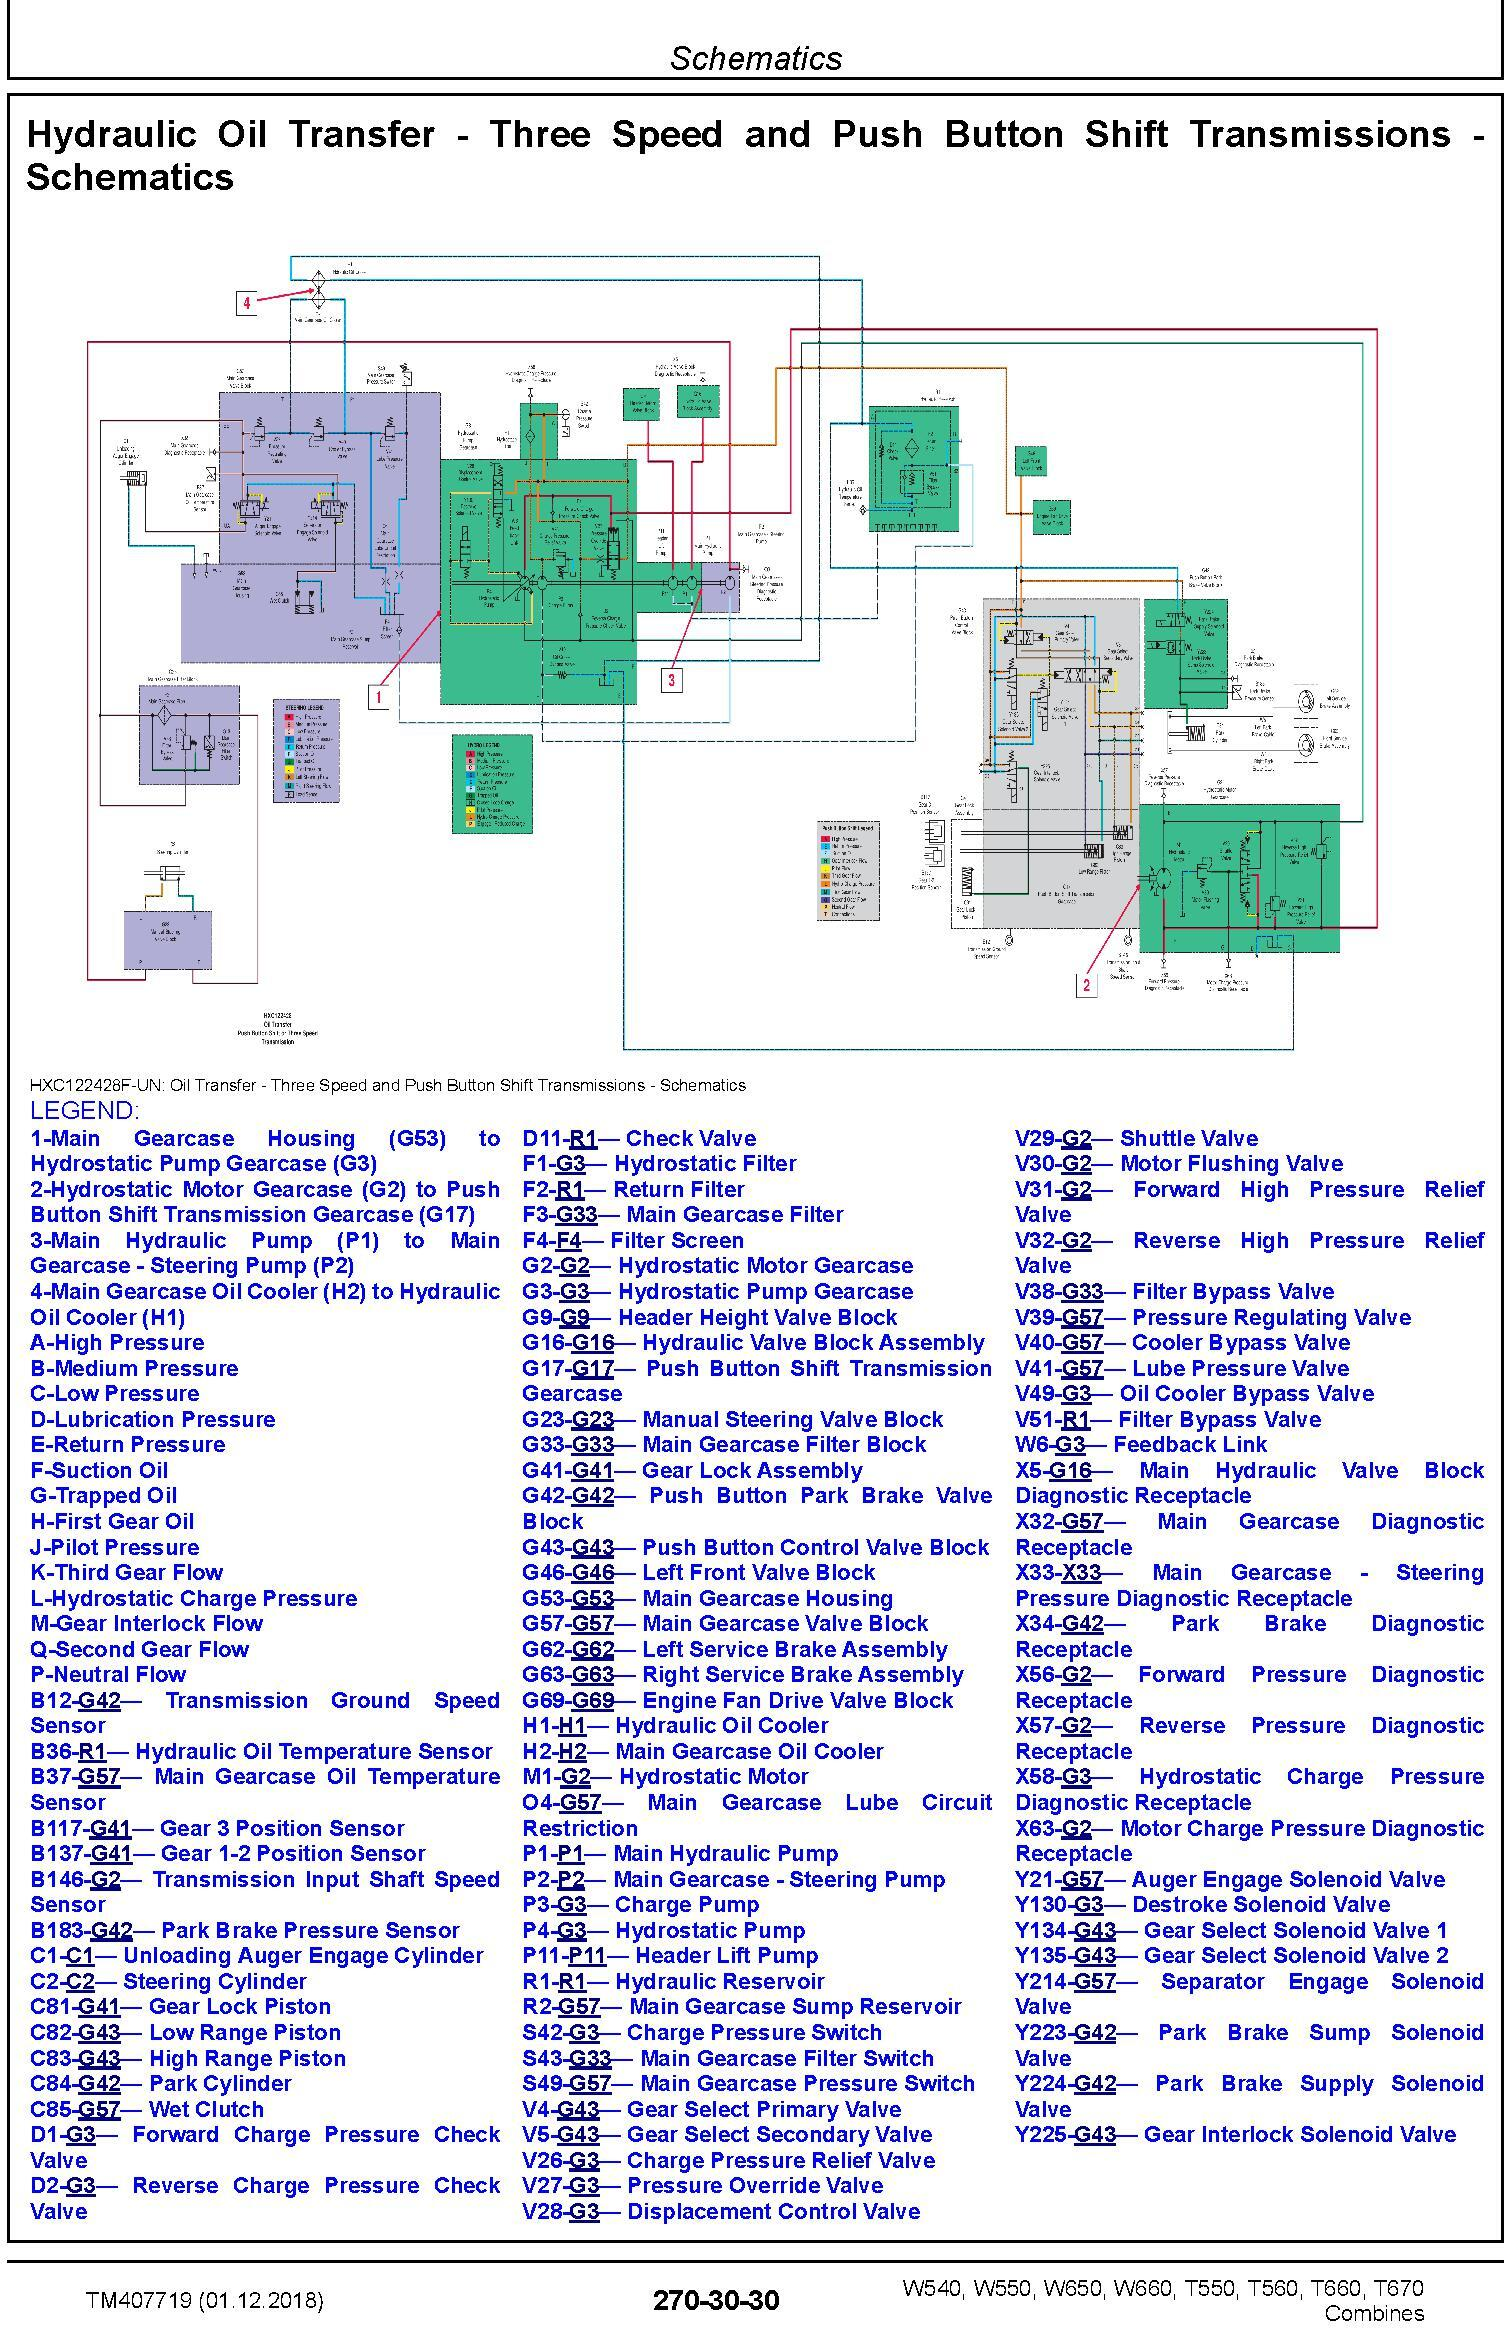 John Deere W540 W550 W650 W660, T550 T560 T660 T670 Combines Diagnostic Technical Manual (TM407719) - 1